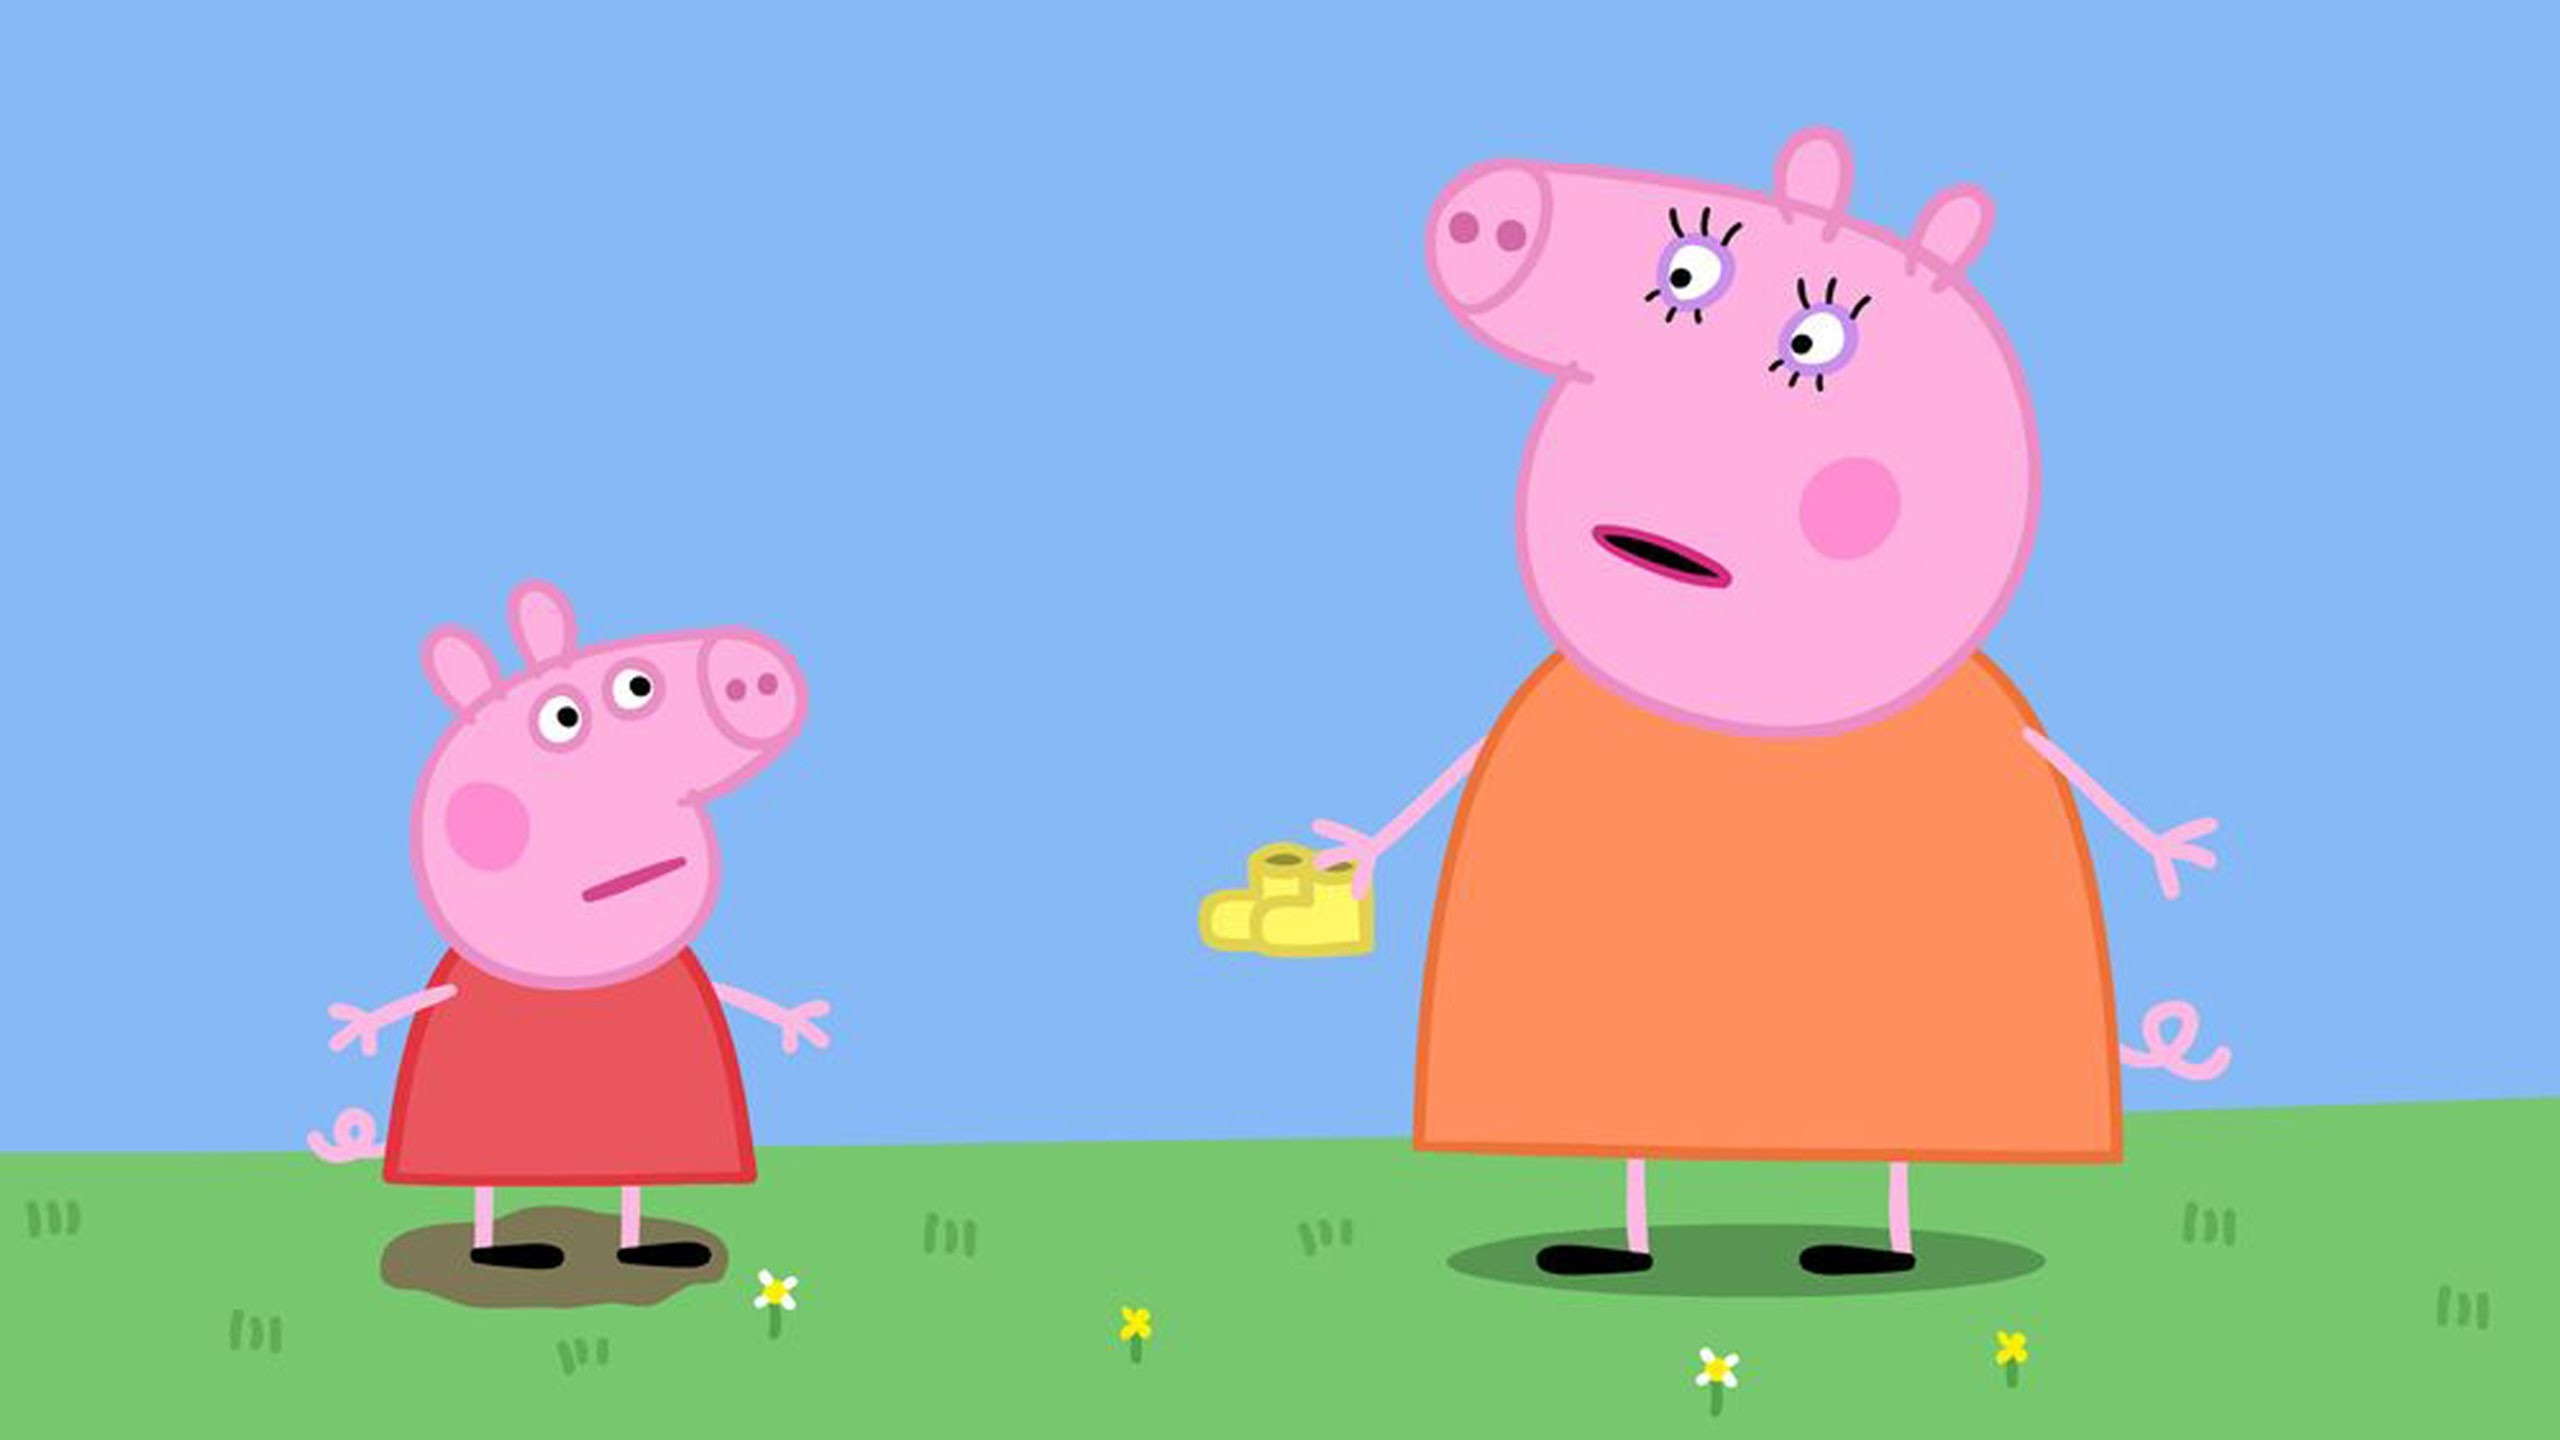 Peppa Pig Coloring Pages – Peppa Pig Coloring Book Peppa Pig Muddy Puddles  Coloring Pages For Kids